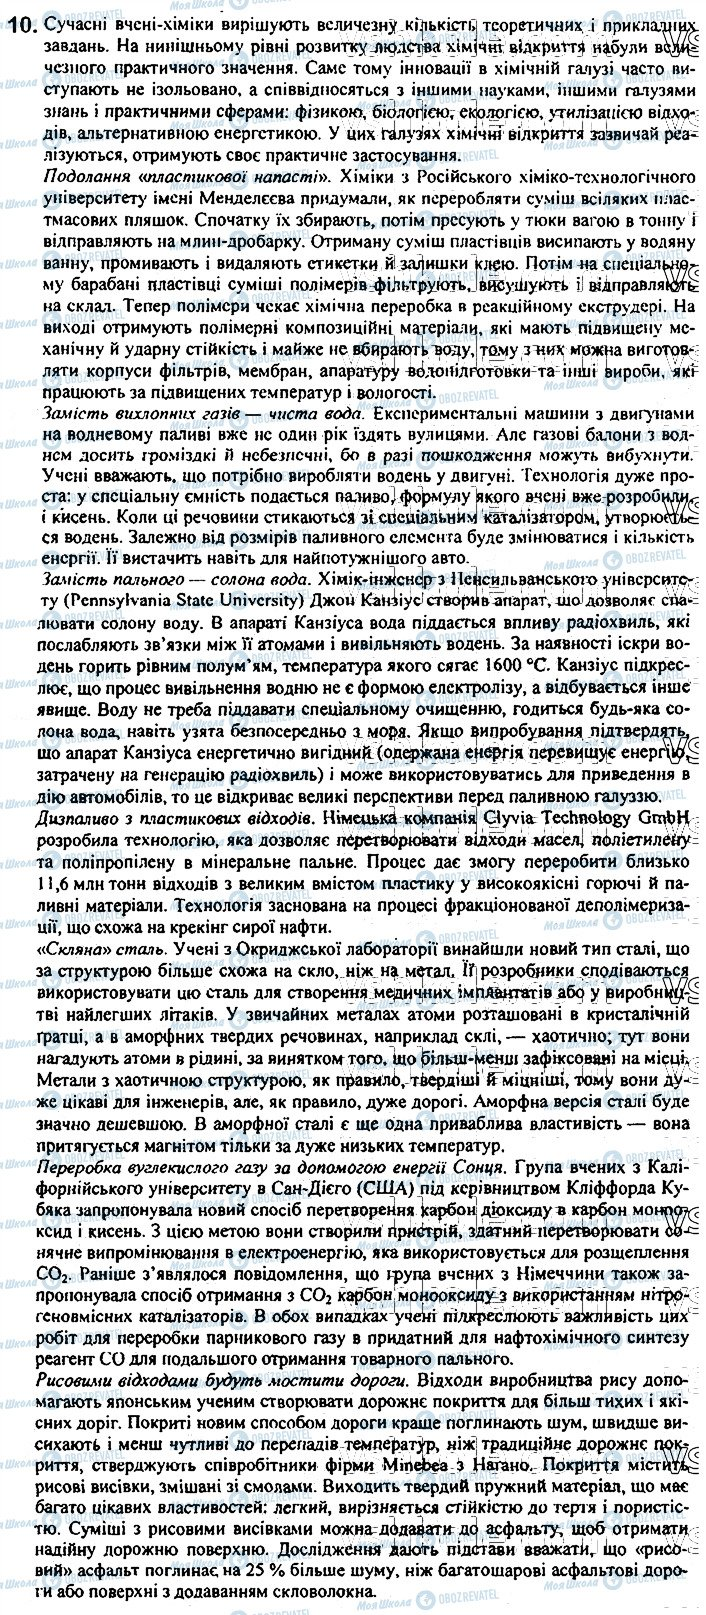 ГДЗ Химия 7 класс страница 10